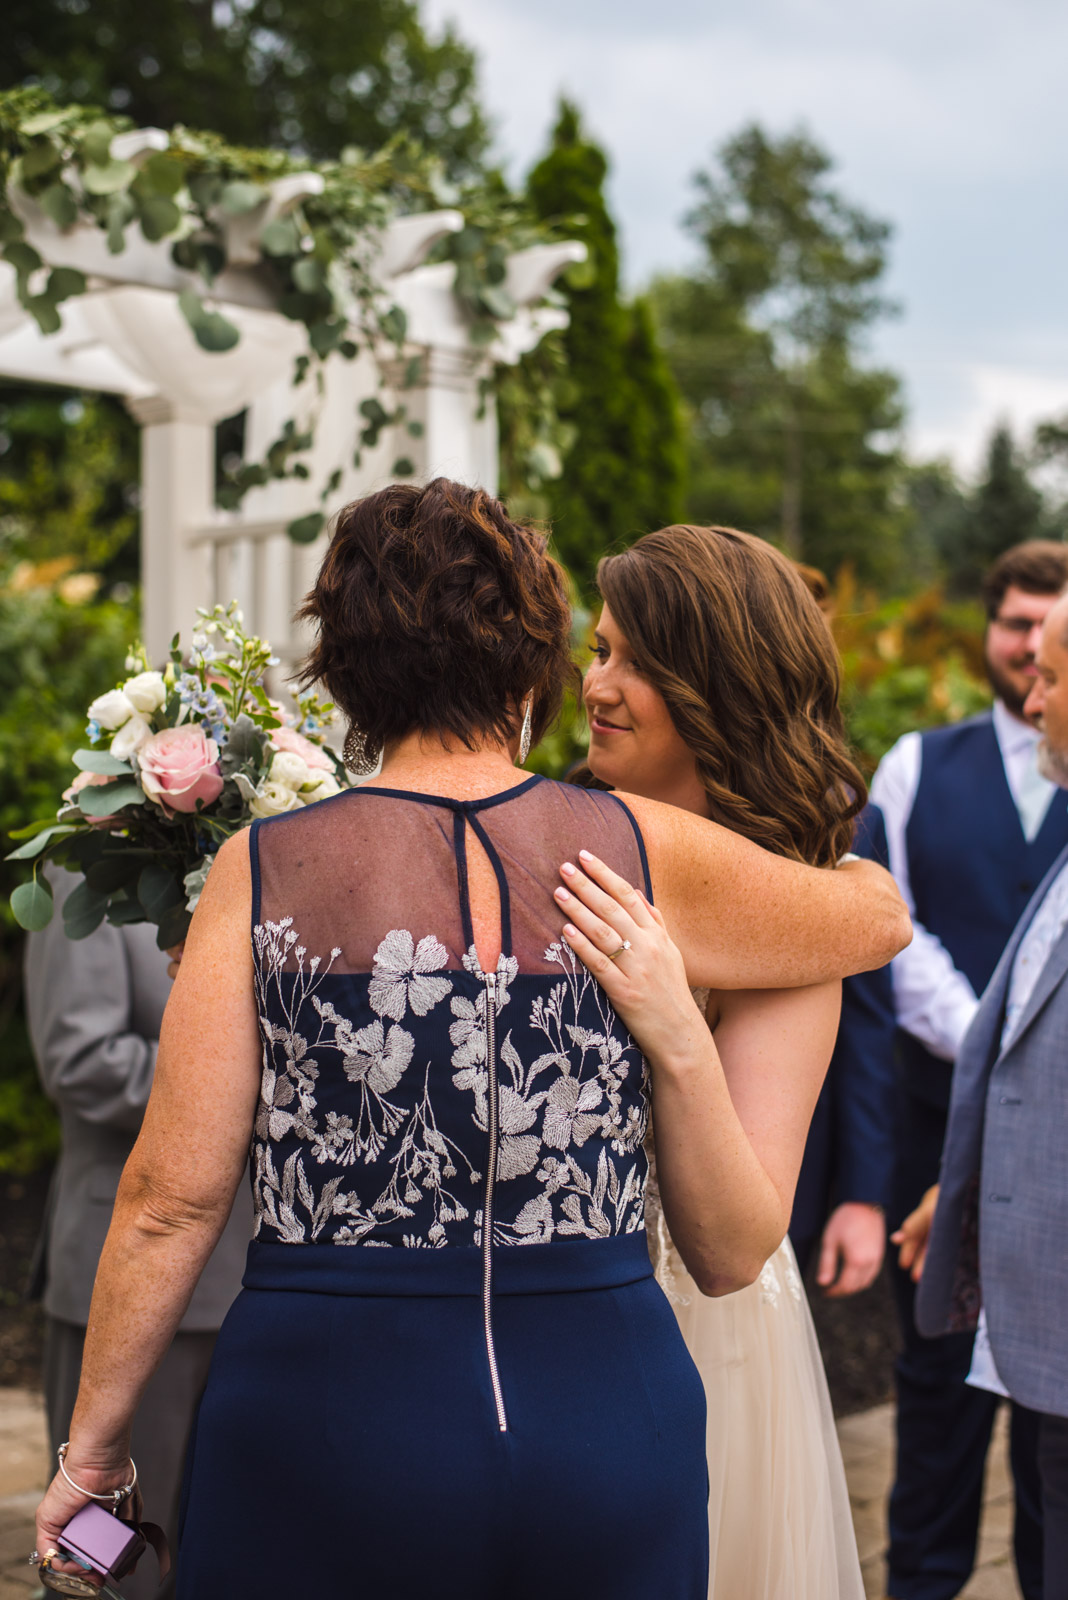 Emerson & Elicia's Golf Course Wedding Aidan & Leanne Hennebry Hamilton Wedding Videographers Photographers Niagara Hush Hush Photography & Film-17.jpg